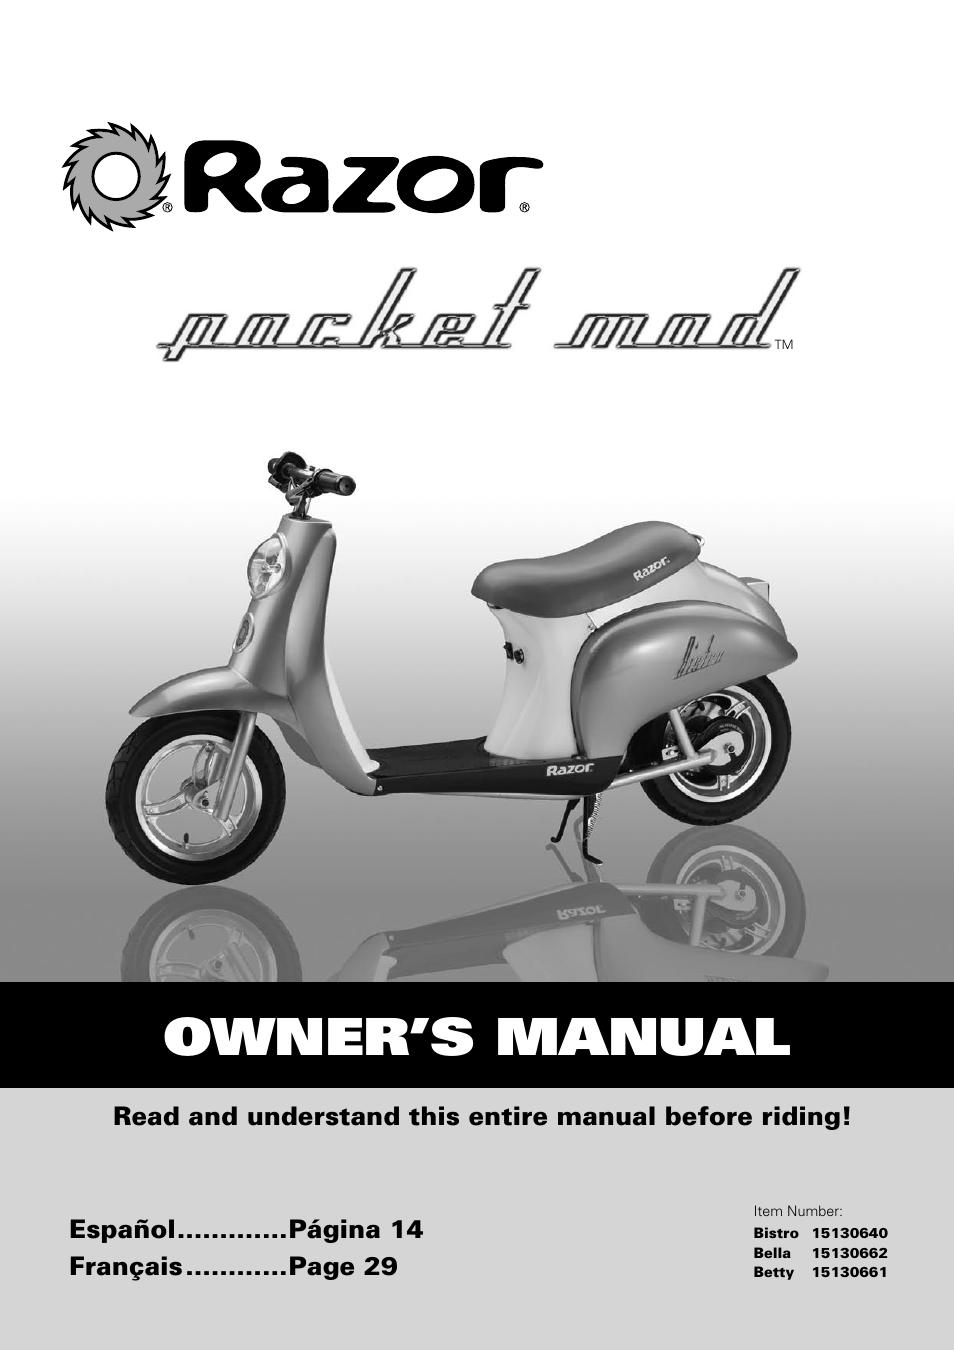 Razor Pocket Mod Scooter Diagram Diy Enthusiasts Wiring Diagrams \u2022  Razor E300 Wiring-Diagram Razor Pocket Mod Scooter Wiring Diagram